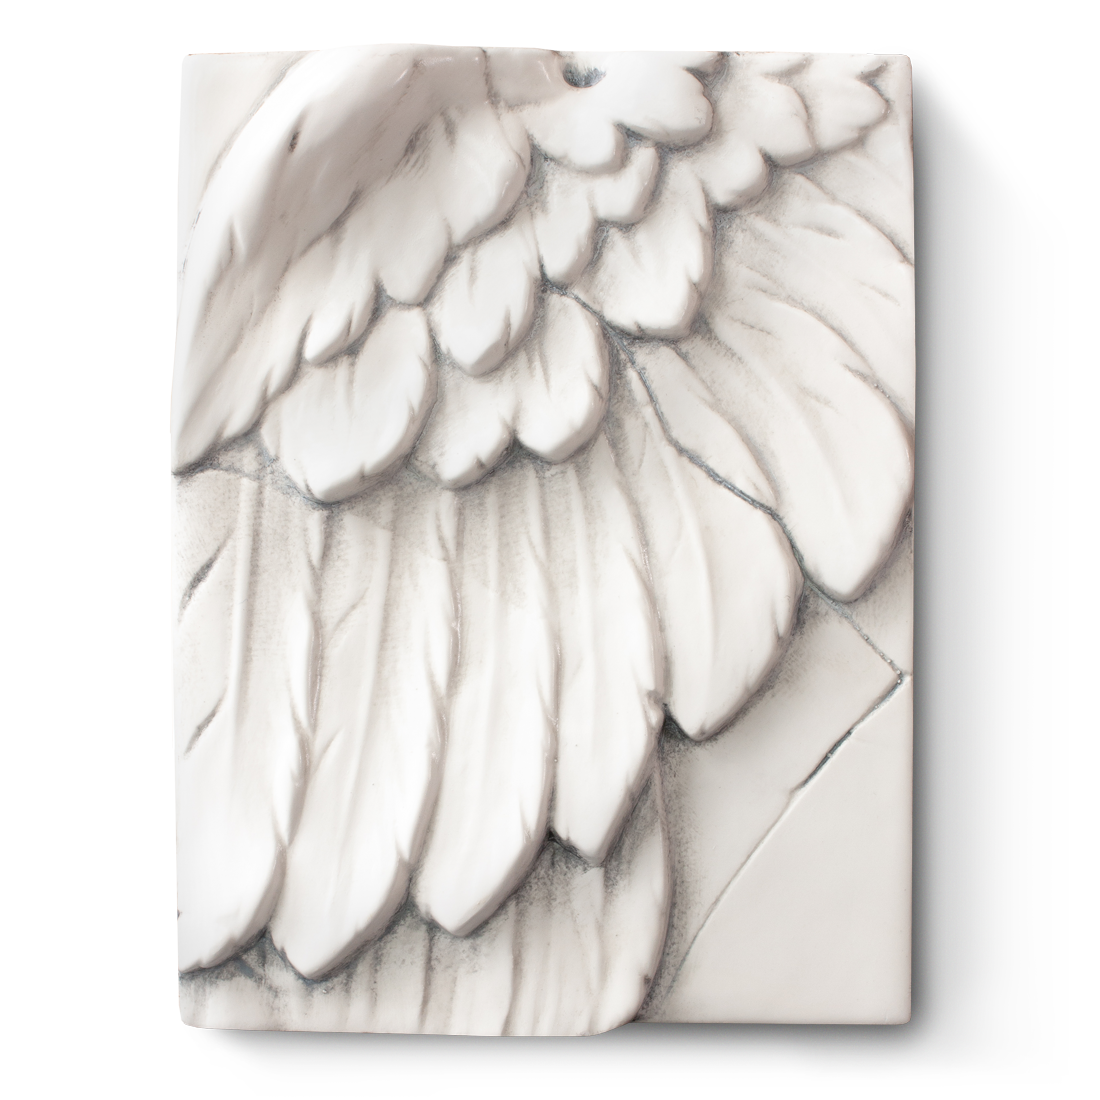 T05 - Wing - Memory Block Sid Dickens